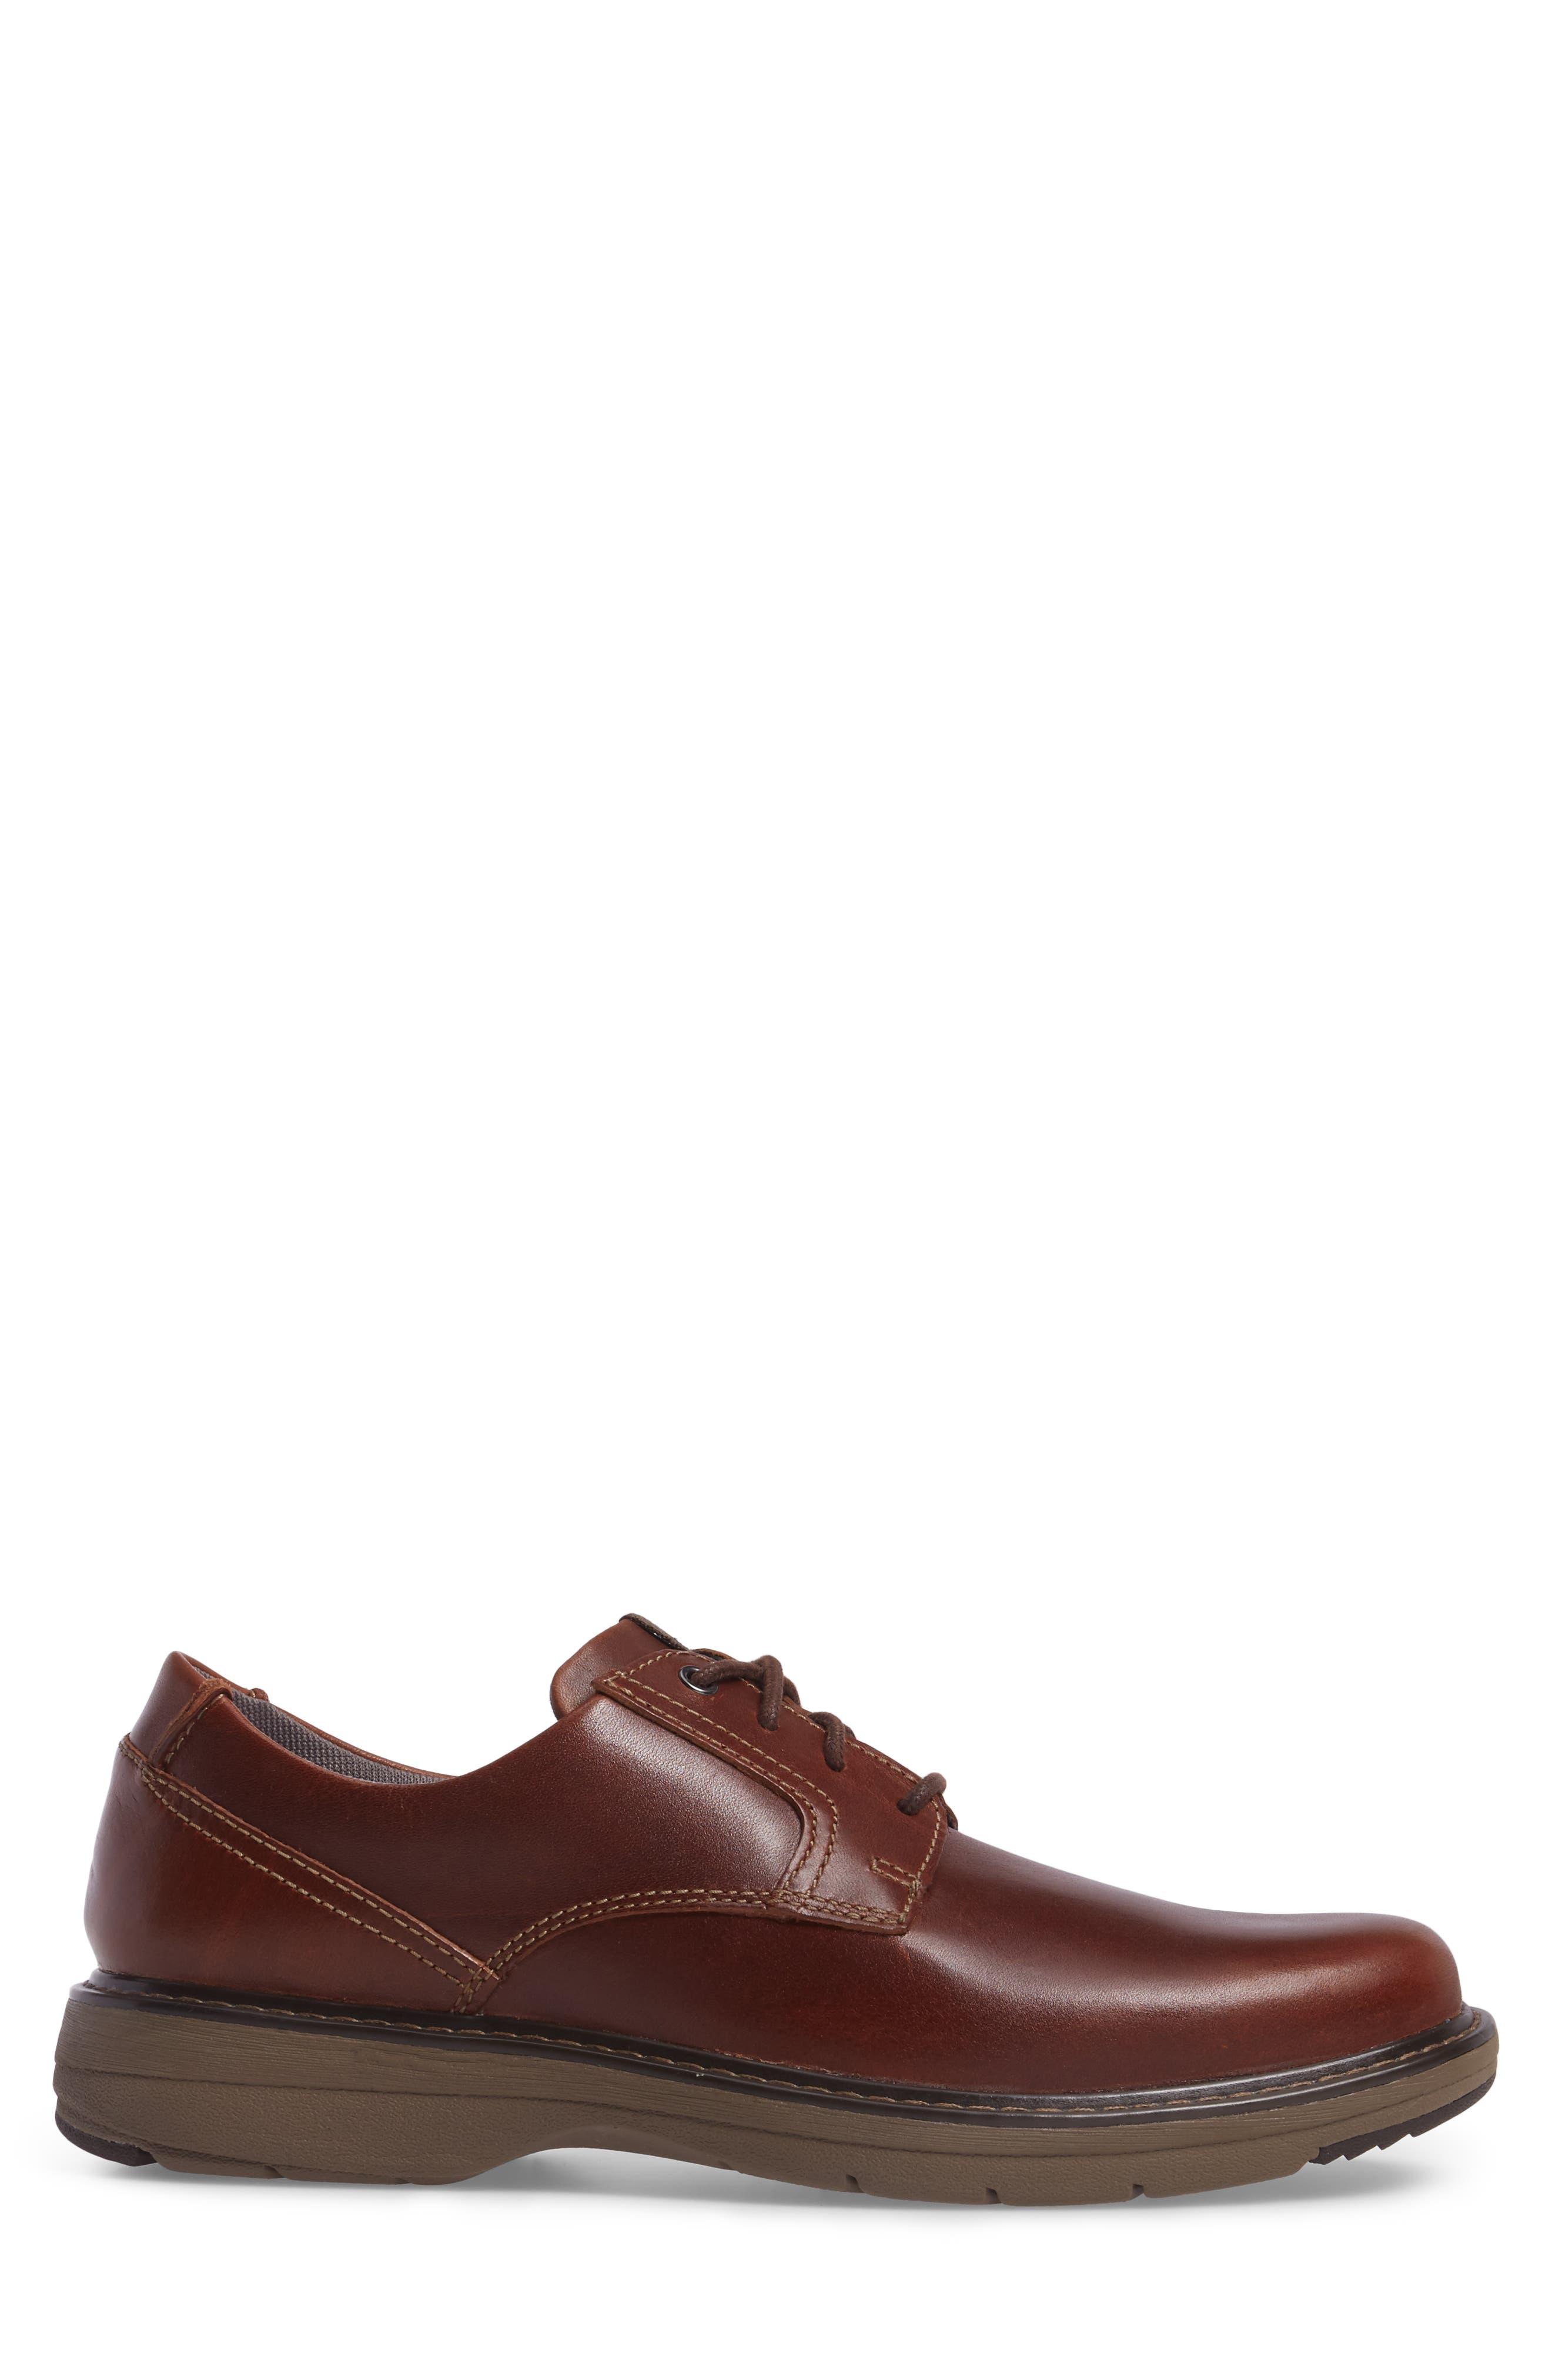 Cushox Plain Toe Derby,                             Alternate thumbnail 3, color,                             Dark Tan Leather